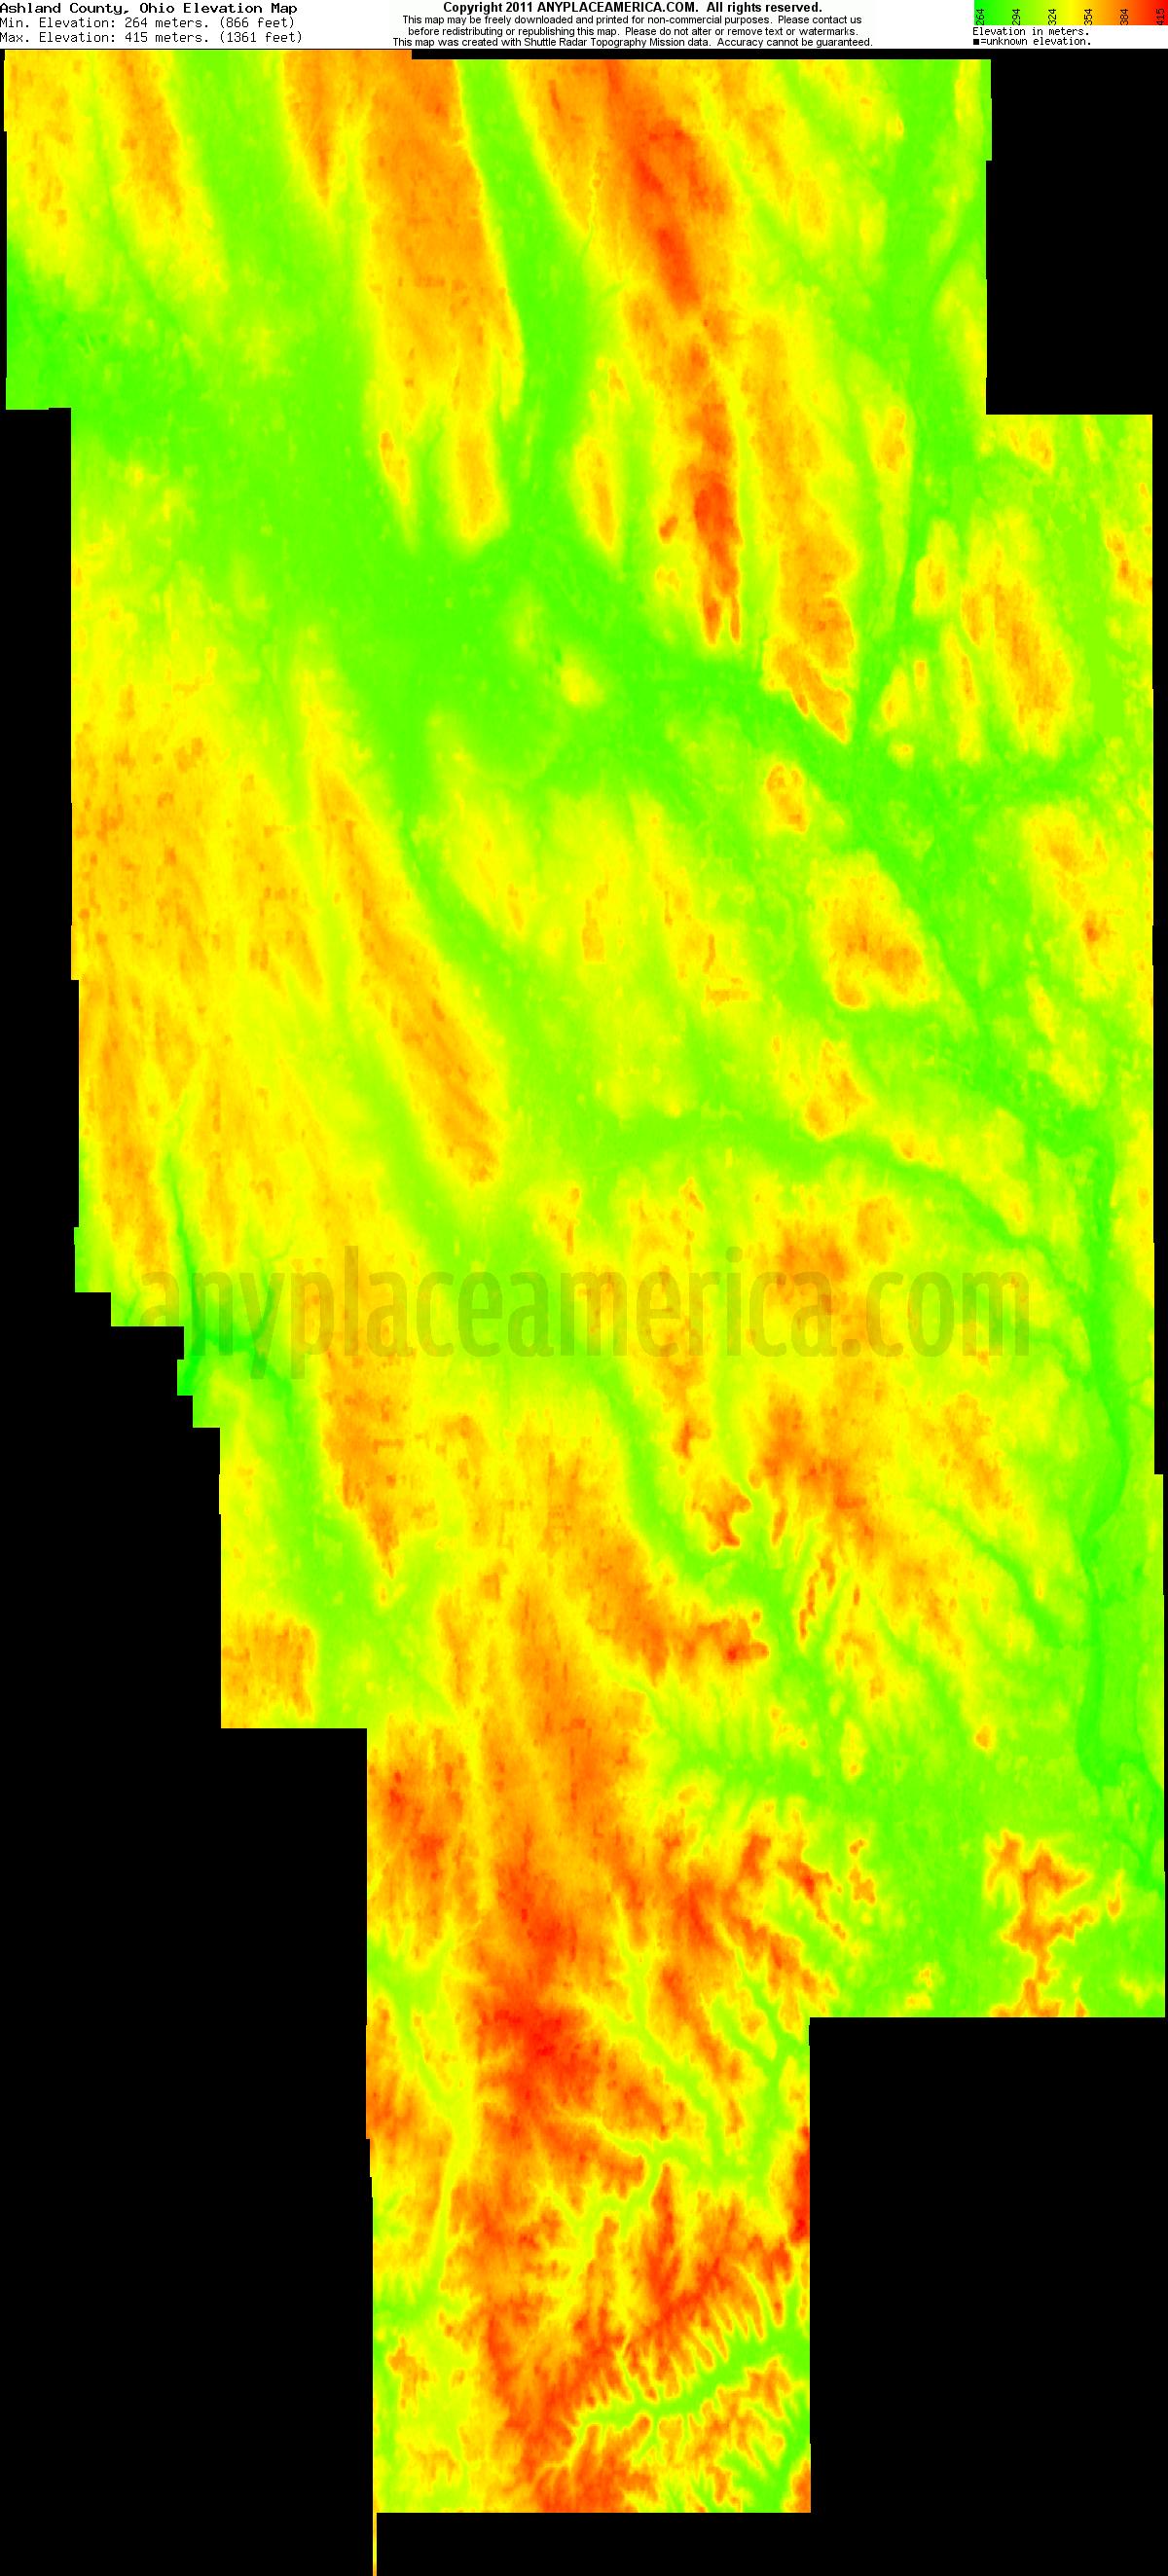 Free Ashland County, Ohio Topo Maps & Elevations on map of warren ohio, crawford county, map of united states ohio, map of jeromesville ohio, map of ashland ohio area, map of cincinnati ohio, hancock county, allen county, map of clear creek township ohio, adams county, map of mifflin township ohio, holmes county, map of chippewa ohio, map of parma ohio, map of broadview heights ohio, map of lebanon ohio, richland county, map of milton township ohio, franklin county, map of canton ohio, clark county, map of beloit ohio, cuyahoga county, map of perry township ohio, knox county, map of orange township ohio, lorain county, wayne county, lake county, medina county, map of ashtabula ohio, erie county, map of west chester ohio, map of cuyahoga river ohio, delaware county, fairfield county, marion county, map of madison ohio,